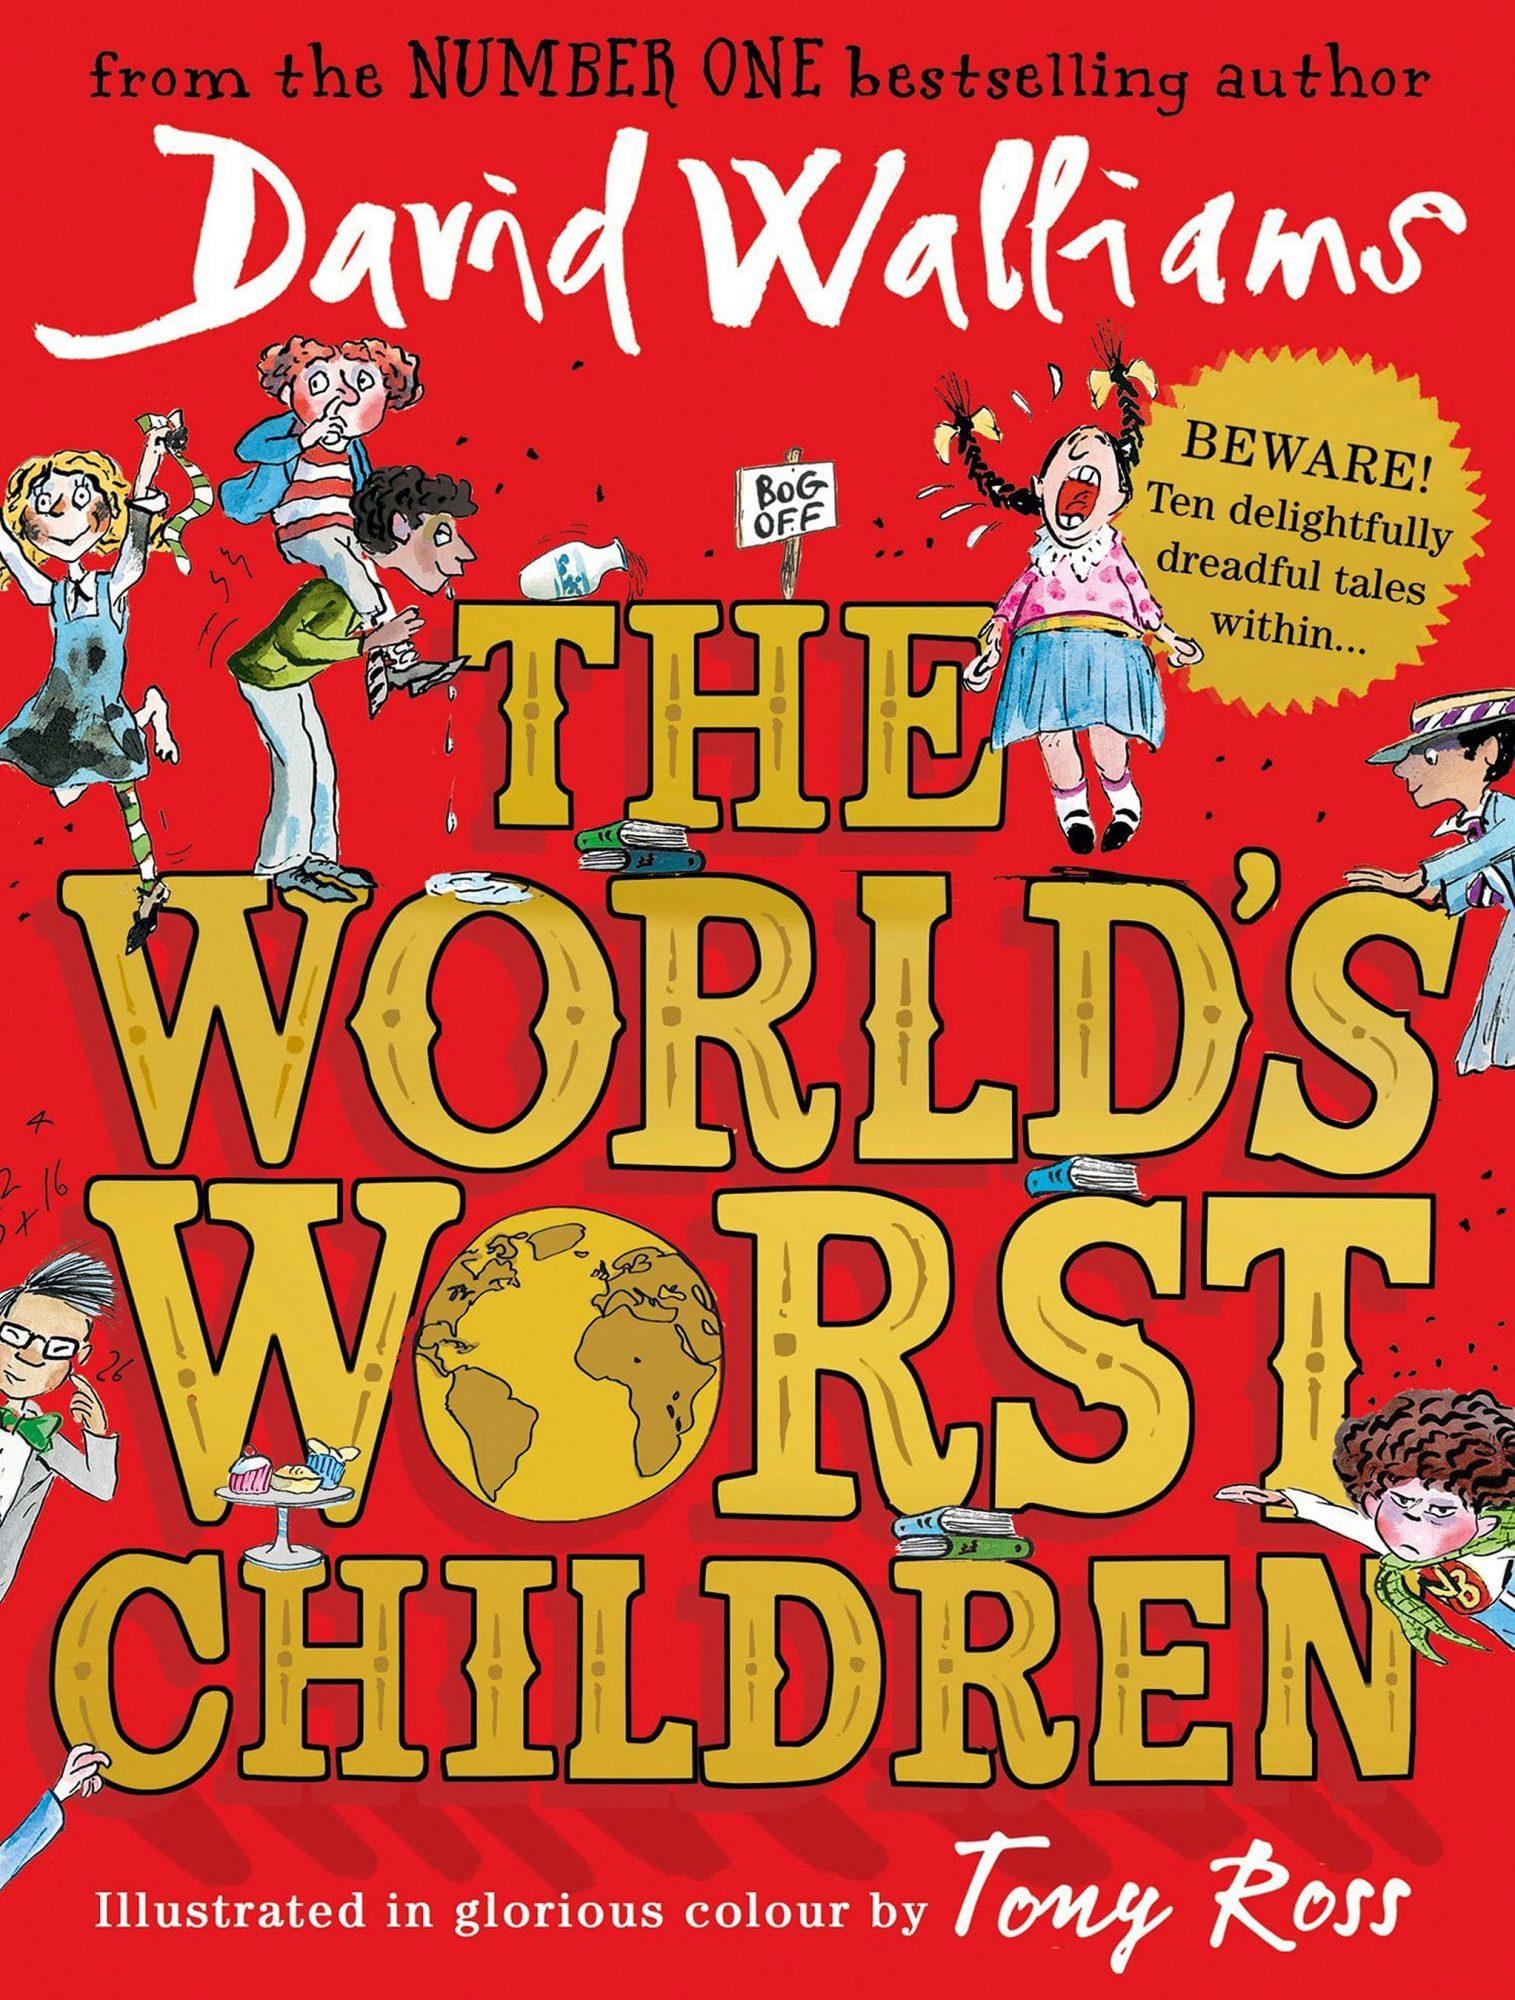 The World's Worst ChildrenBook by David Walliams